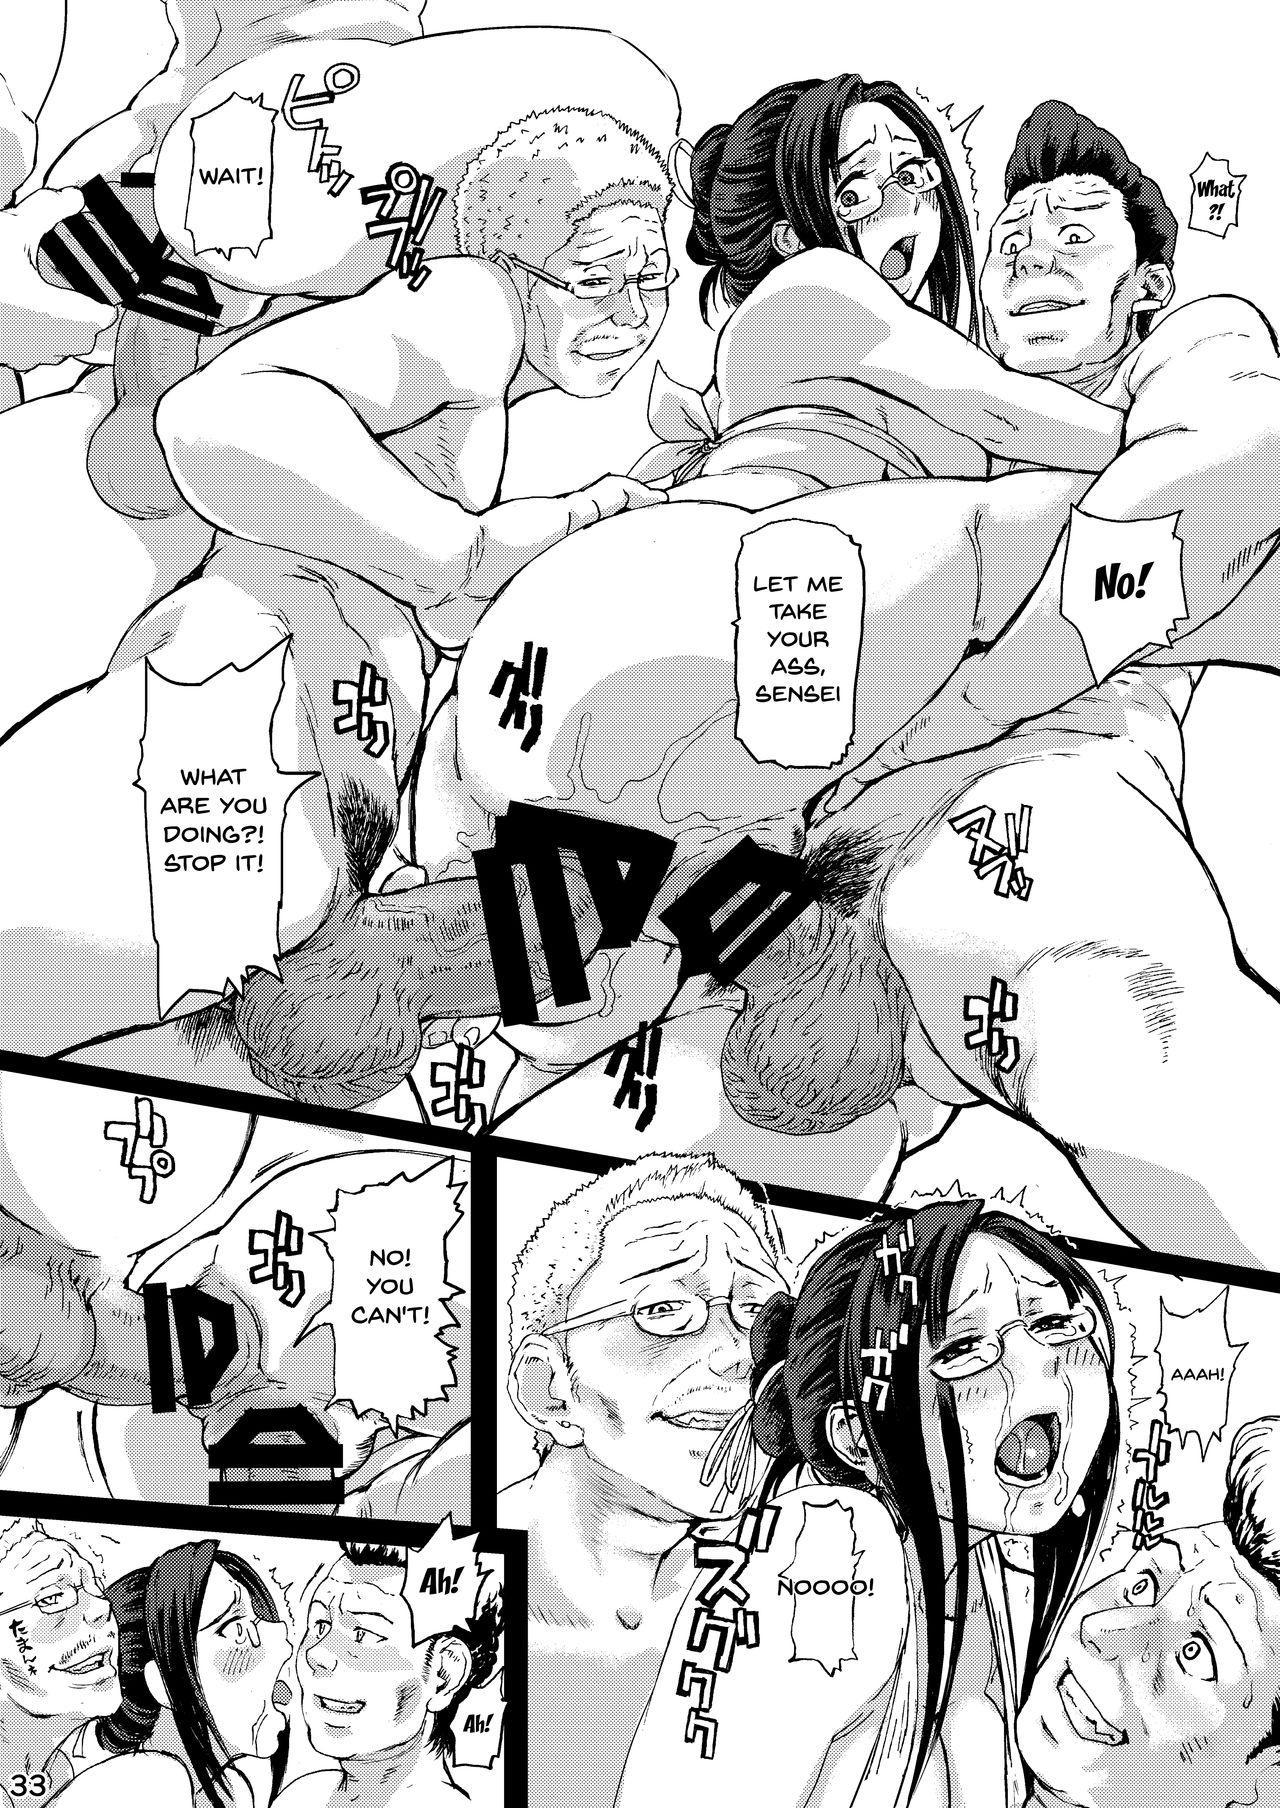 [POWERPLAY (Various)] CAPCOM (& MORE!) VS FIGHTING GIRLS Swimsuit & Gangbang Special (Various) [English] {Doujins.com} [Digital] 29